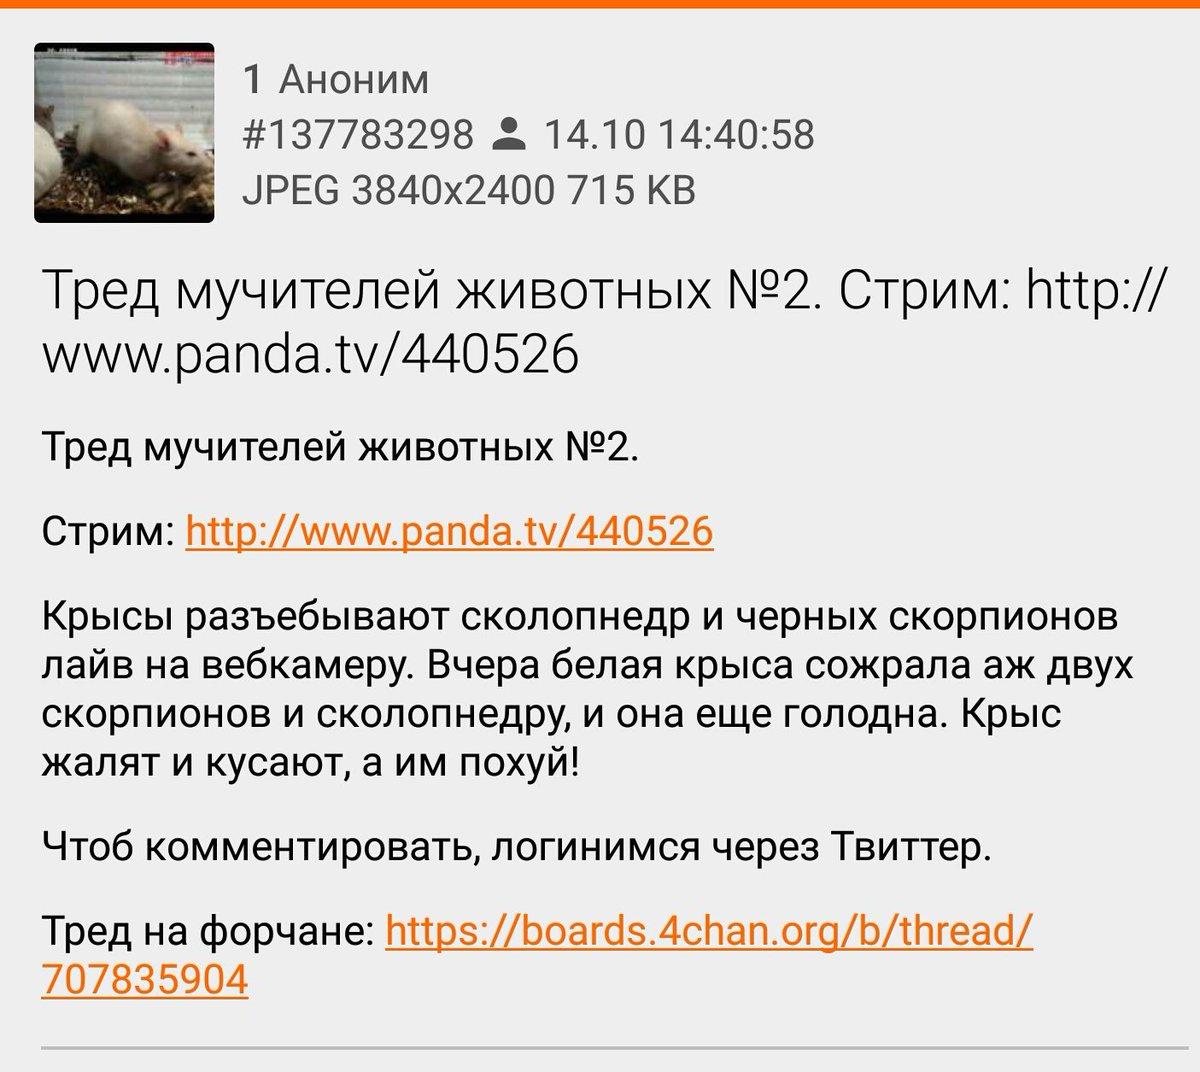 Русские прокси socks5 для брут World Of Tanks